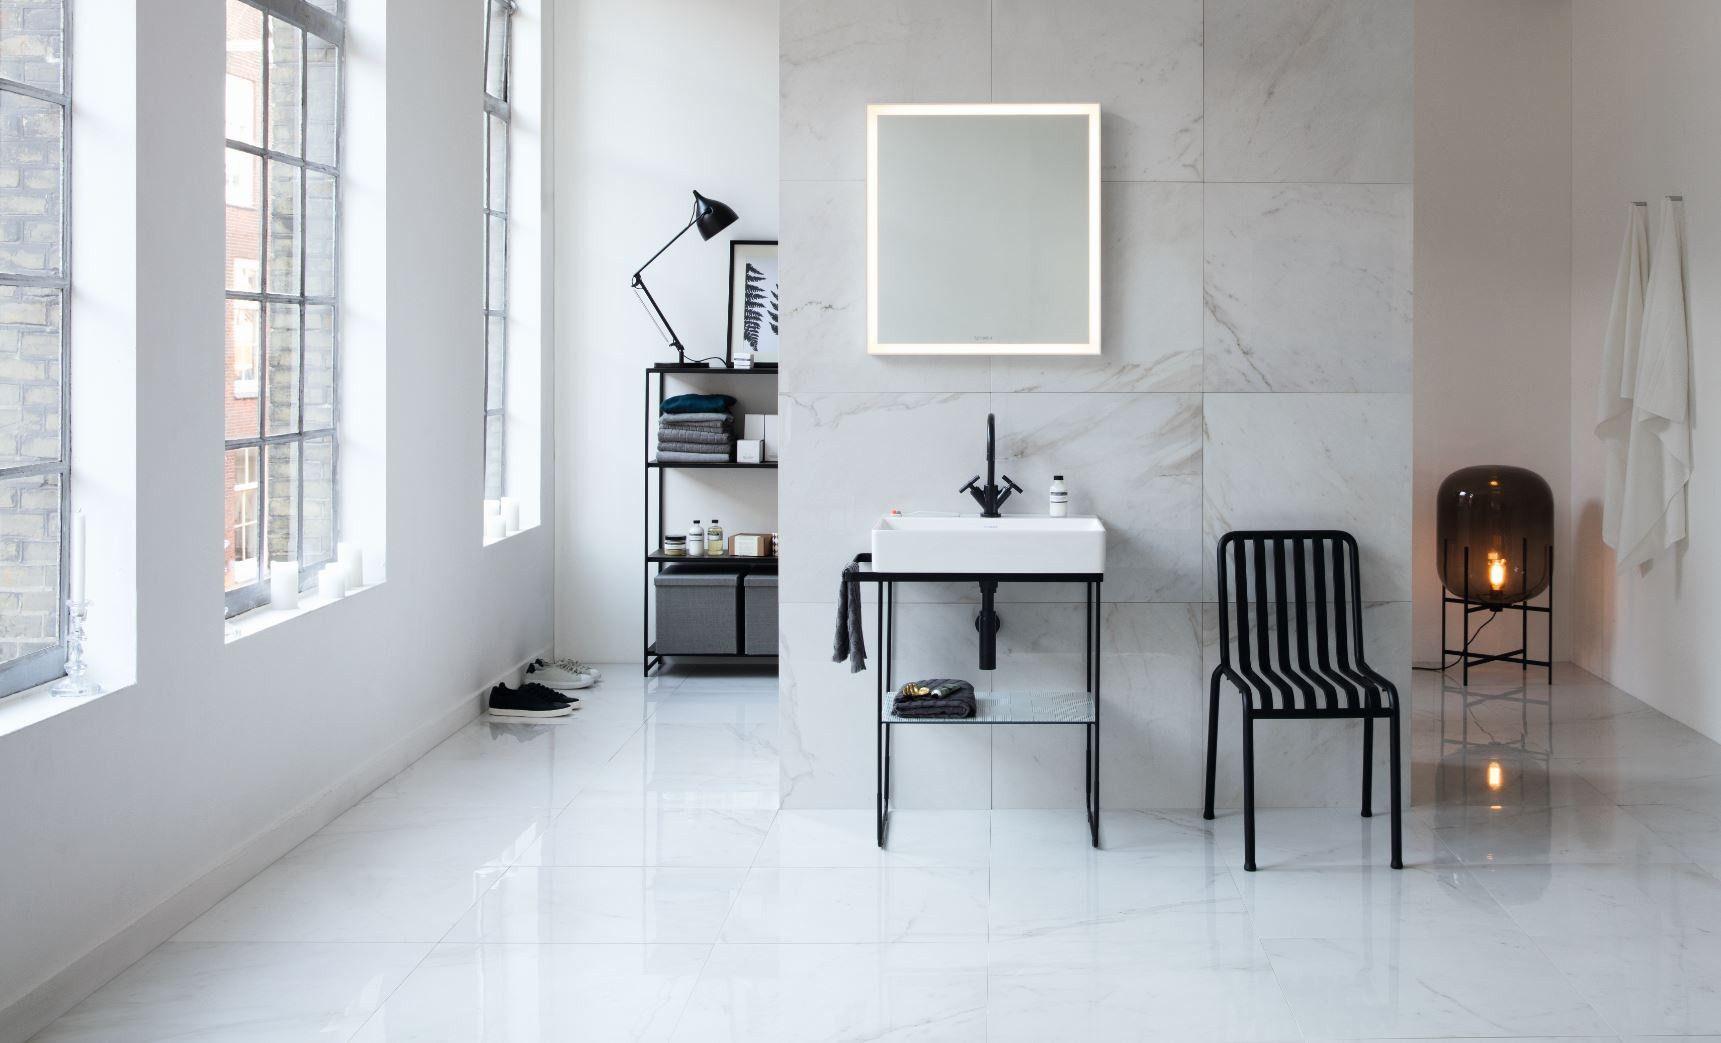 Tendencias de baños Duravit - Duran, diseño de baños modernos Mallorca